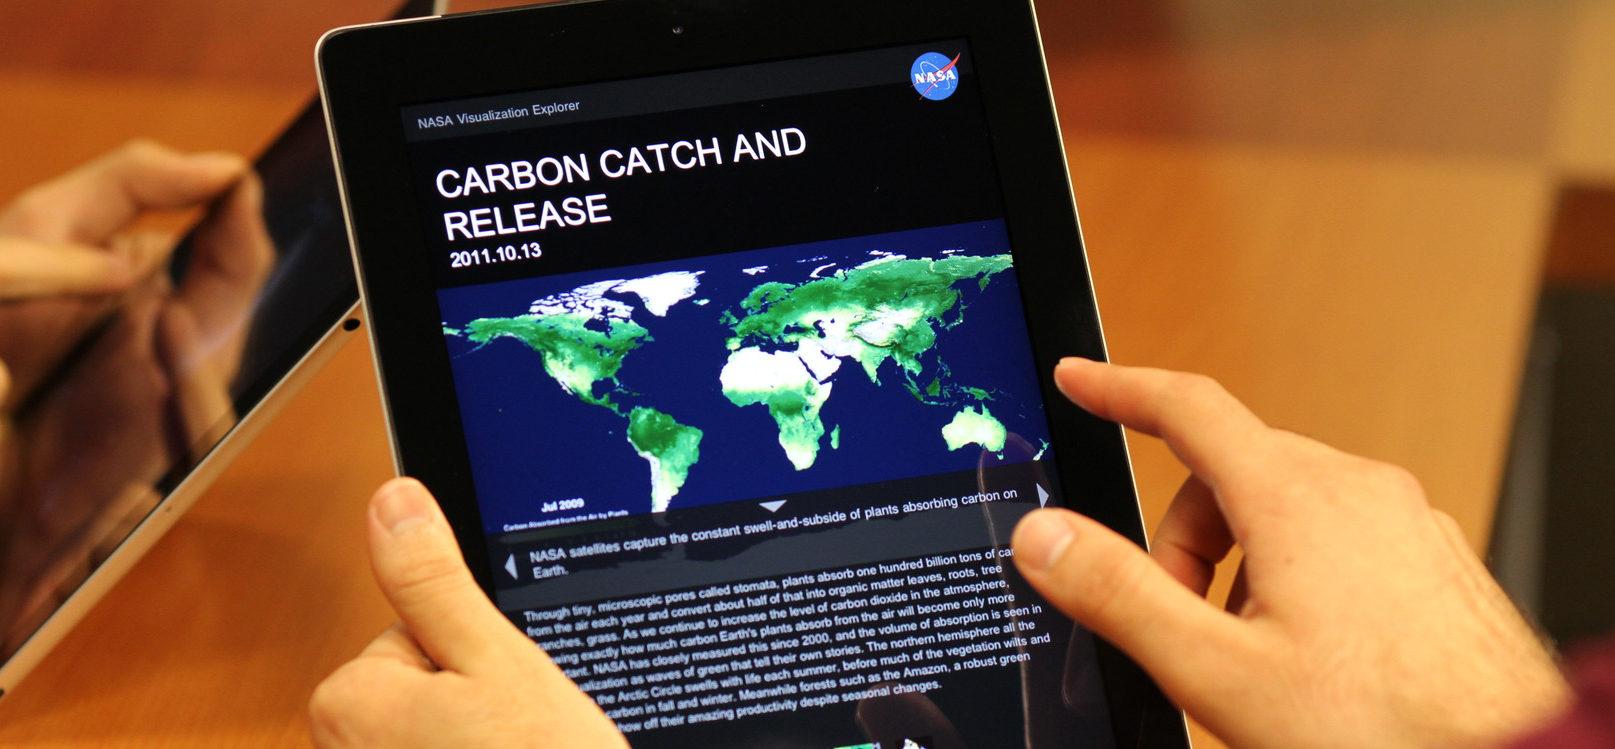 Kuva: NASA Goddard Photo and Video (cc)